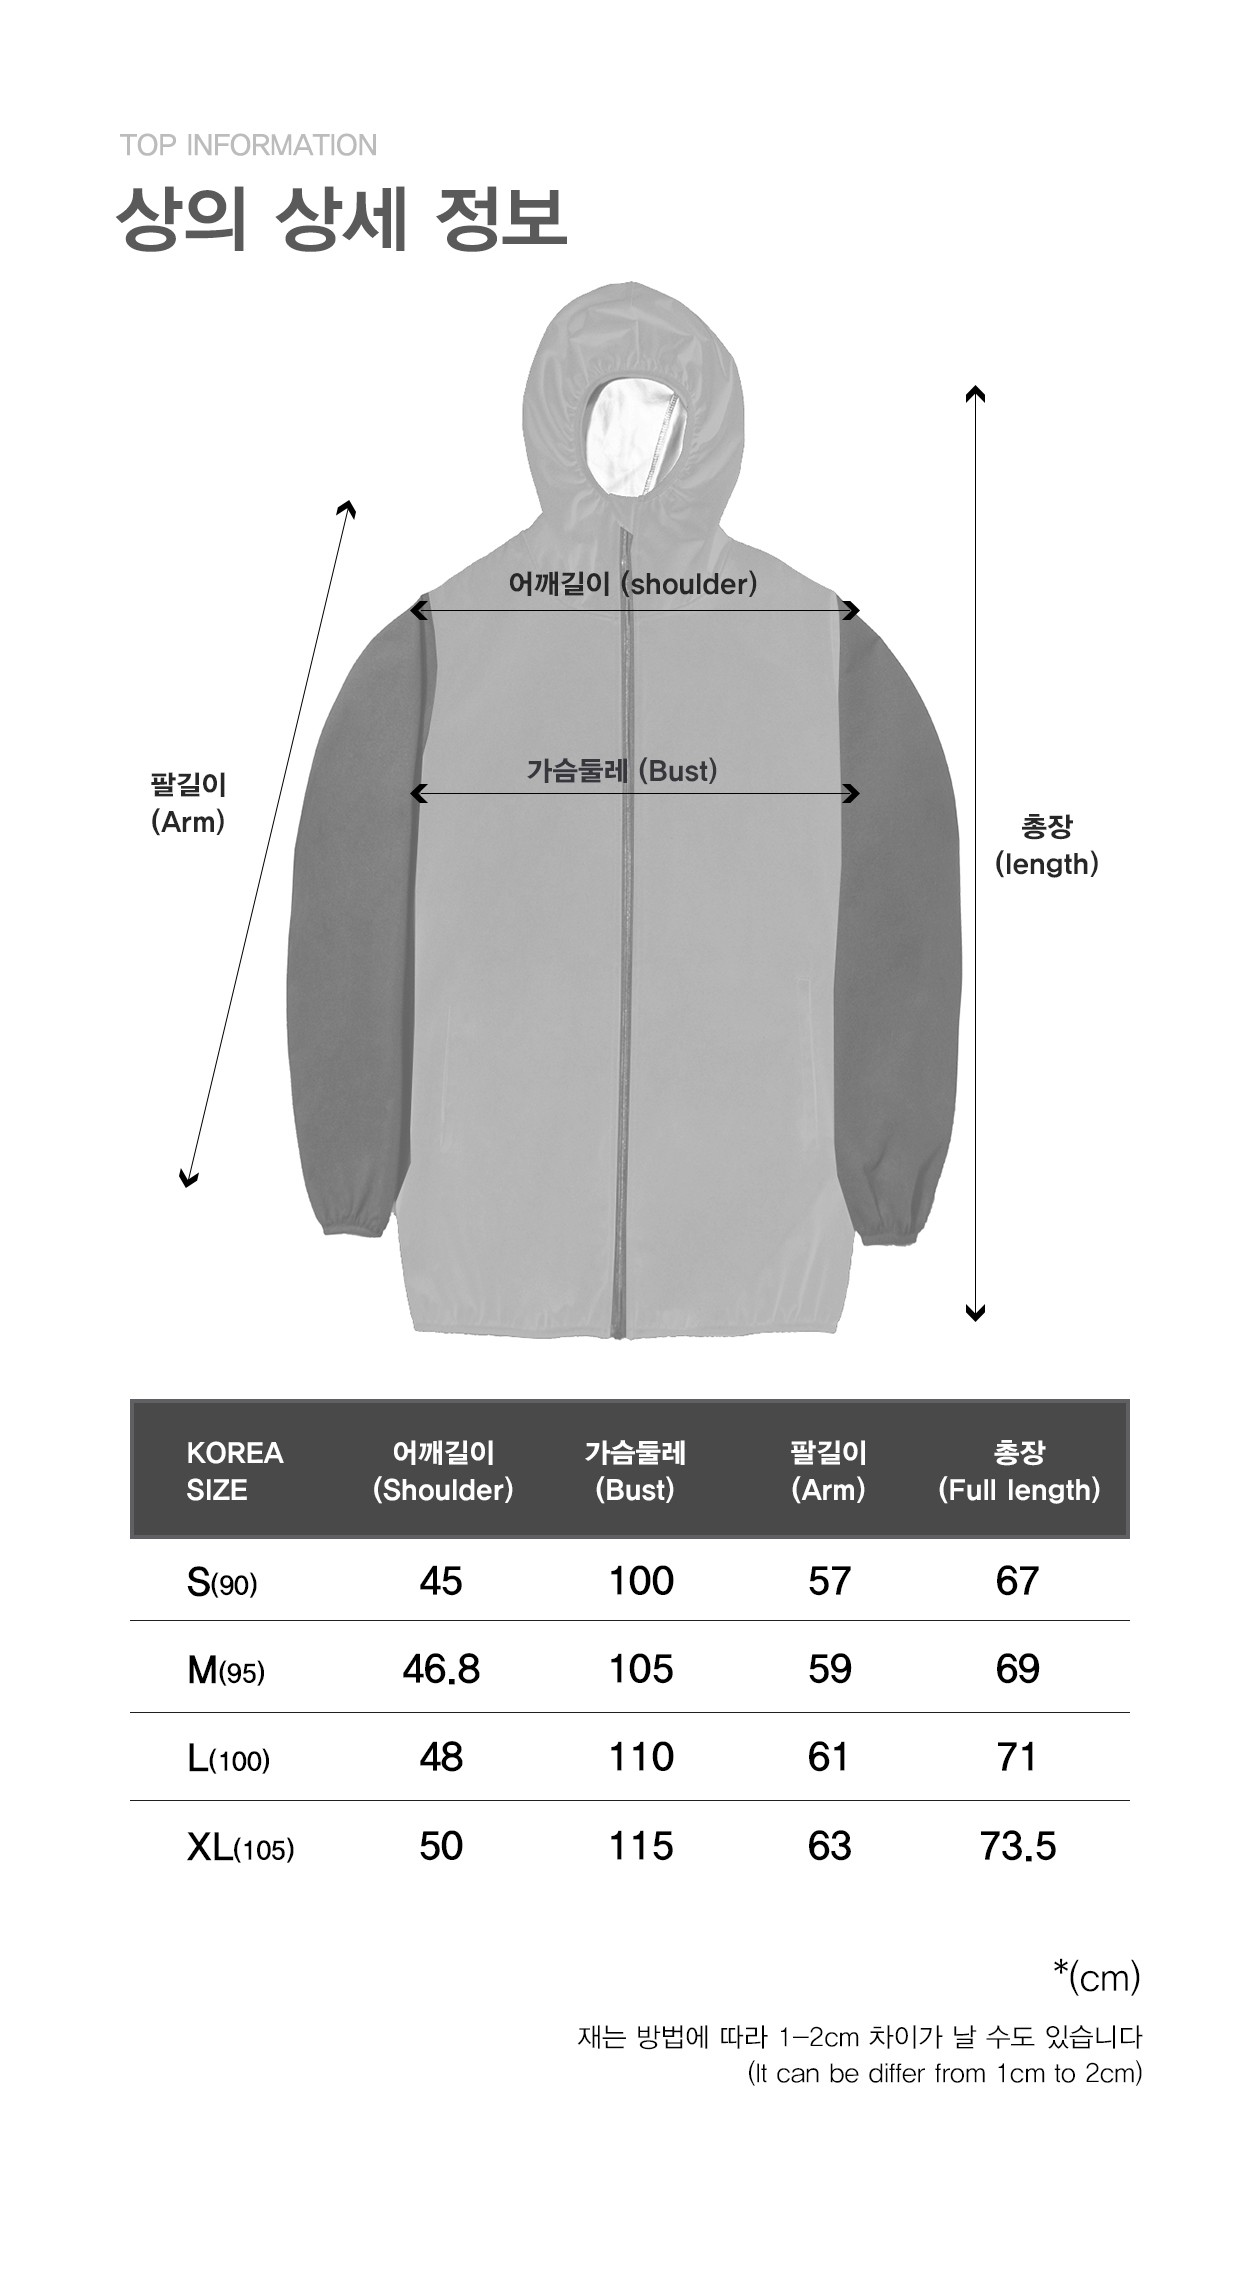 KOREA SIZE 어깨길이(Shoulder) S(90) 45 M(95) 46.8 L(100) 48 XL(105) 50  가슴둘레(Busd) S(90) 100 M(95) 105 L(100) 110 XL(105) 115 팔길이(Arm) S(90) 57 M(95) 59 L(100) 61 XL(105) 63  총장(Full length) S(90) 67 M(95) 69 L(100) 71 XL(105) 73.5 *(cm) 재는 방법에 따라 1~2cm 차이가 날 수도 있습니다(It can be differ from 1cm to 2cm)